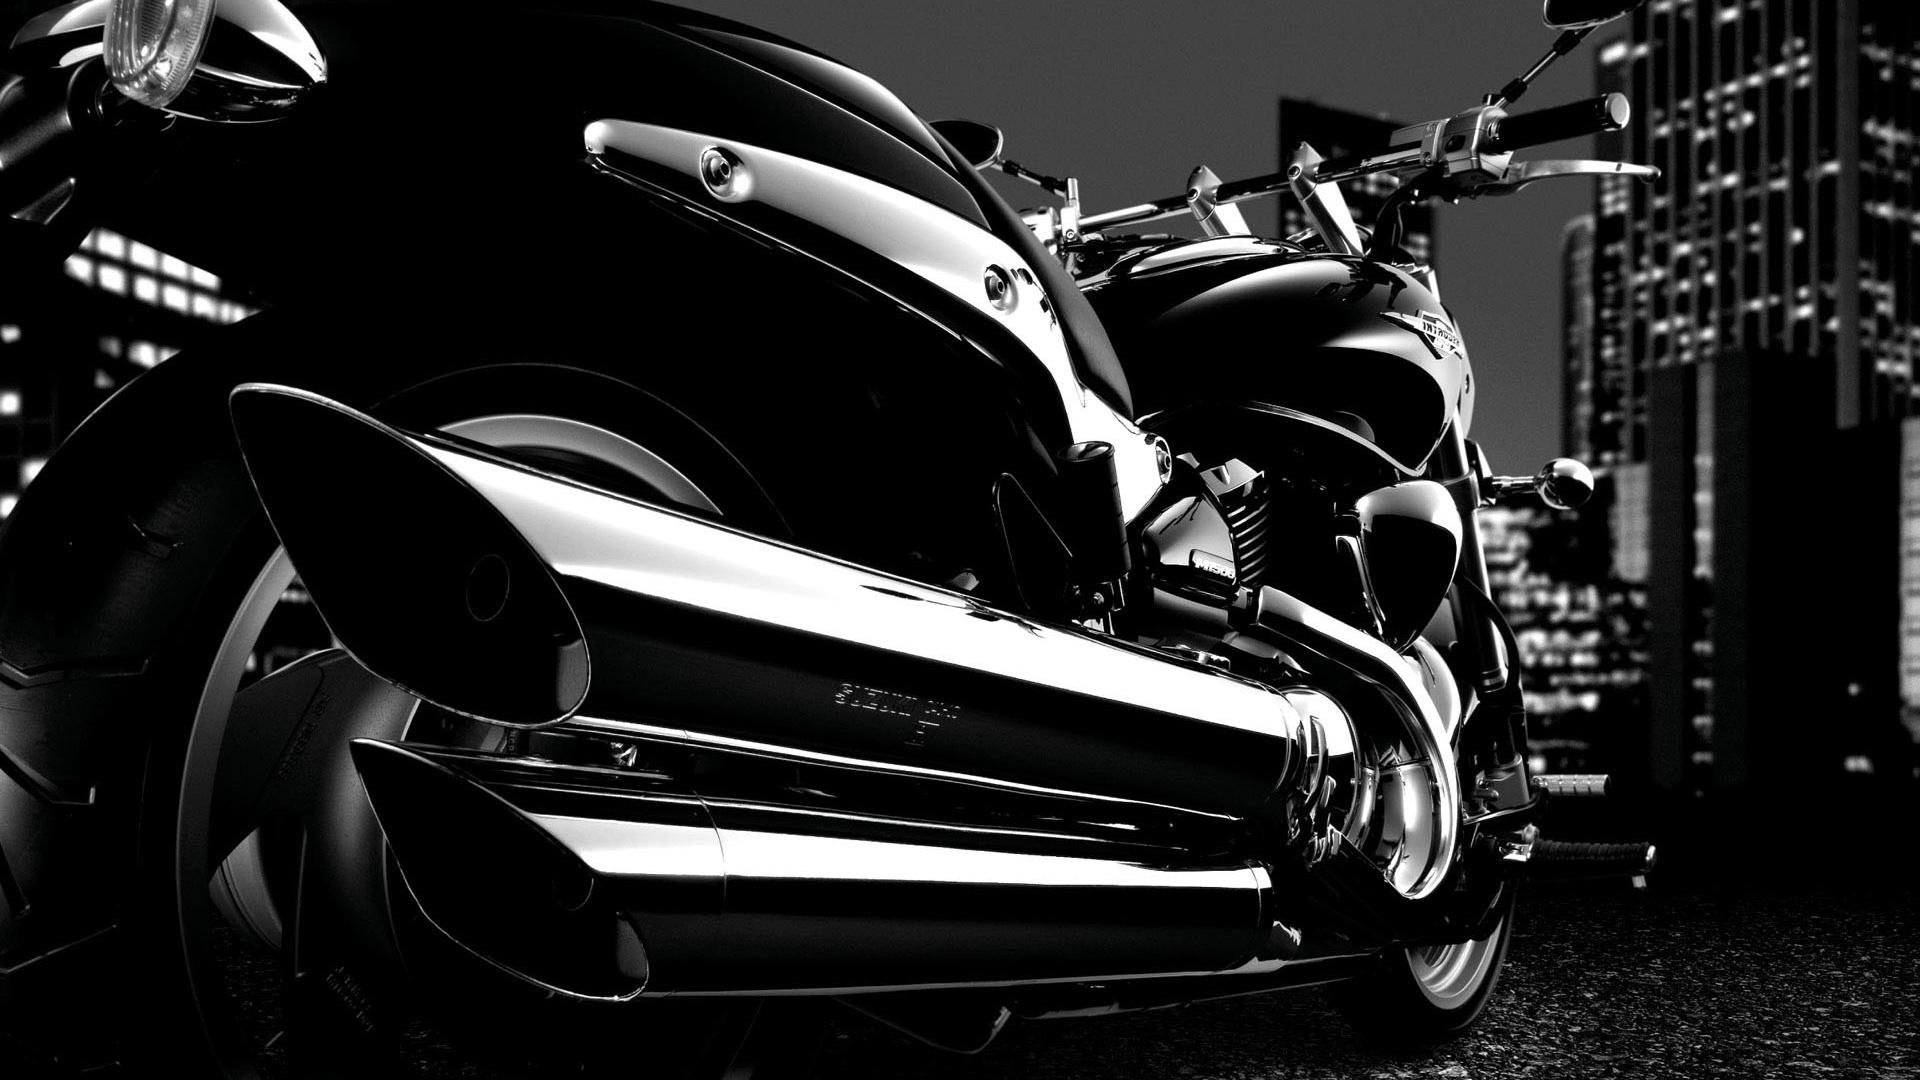 Harley Davidson Wallpapers High Quality